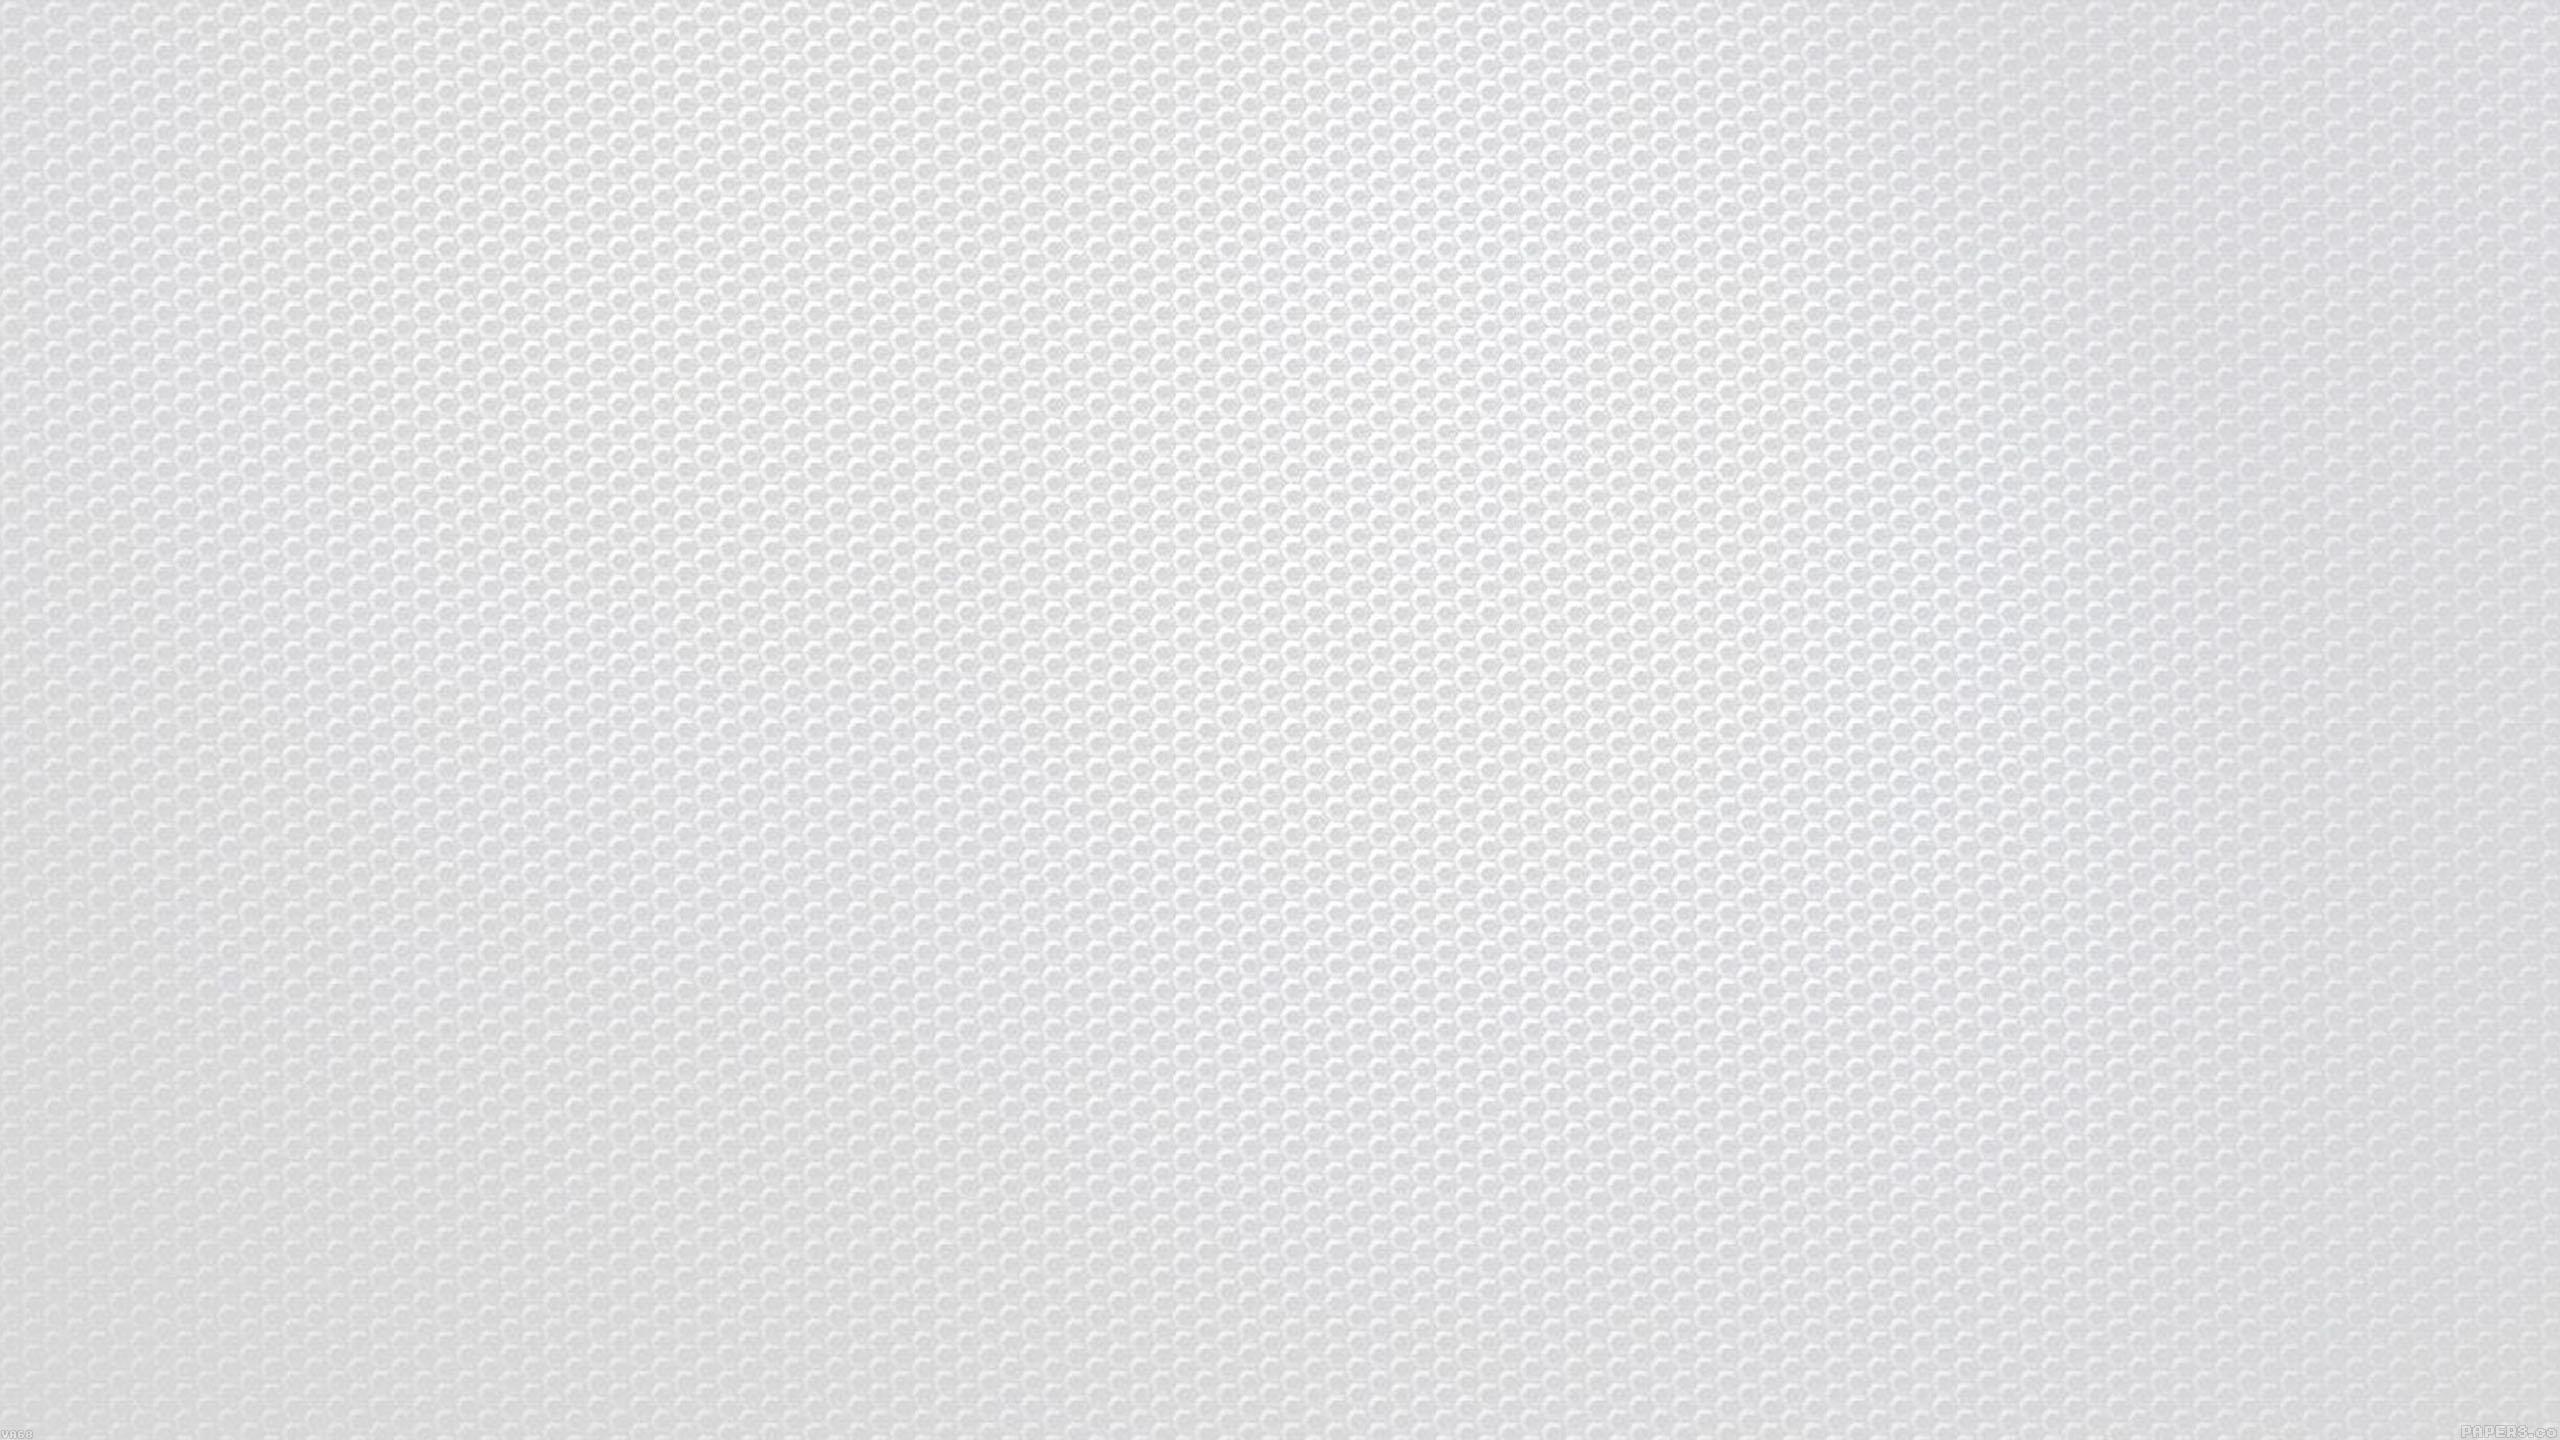 2560 by 1440 Huawei P7 White